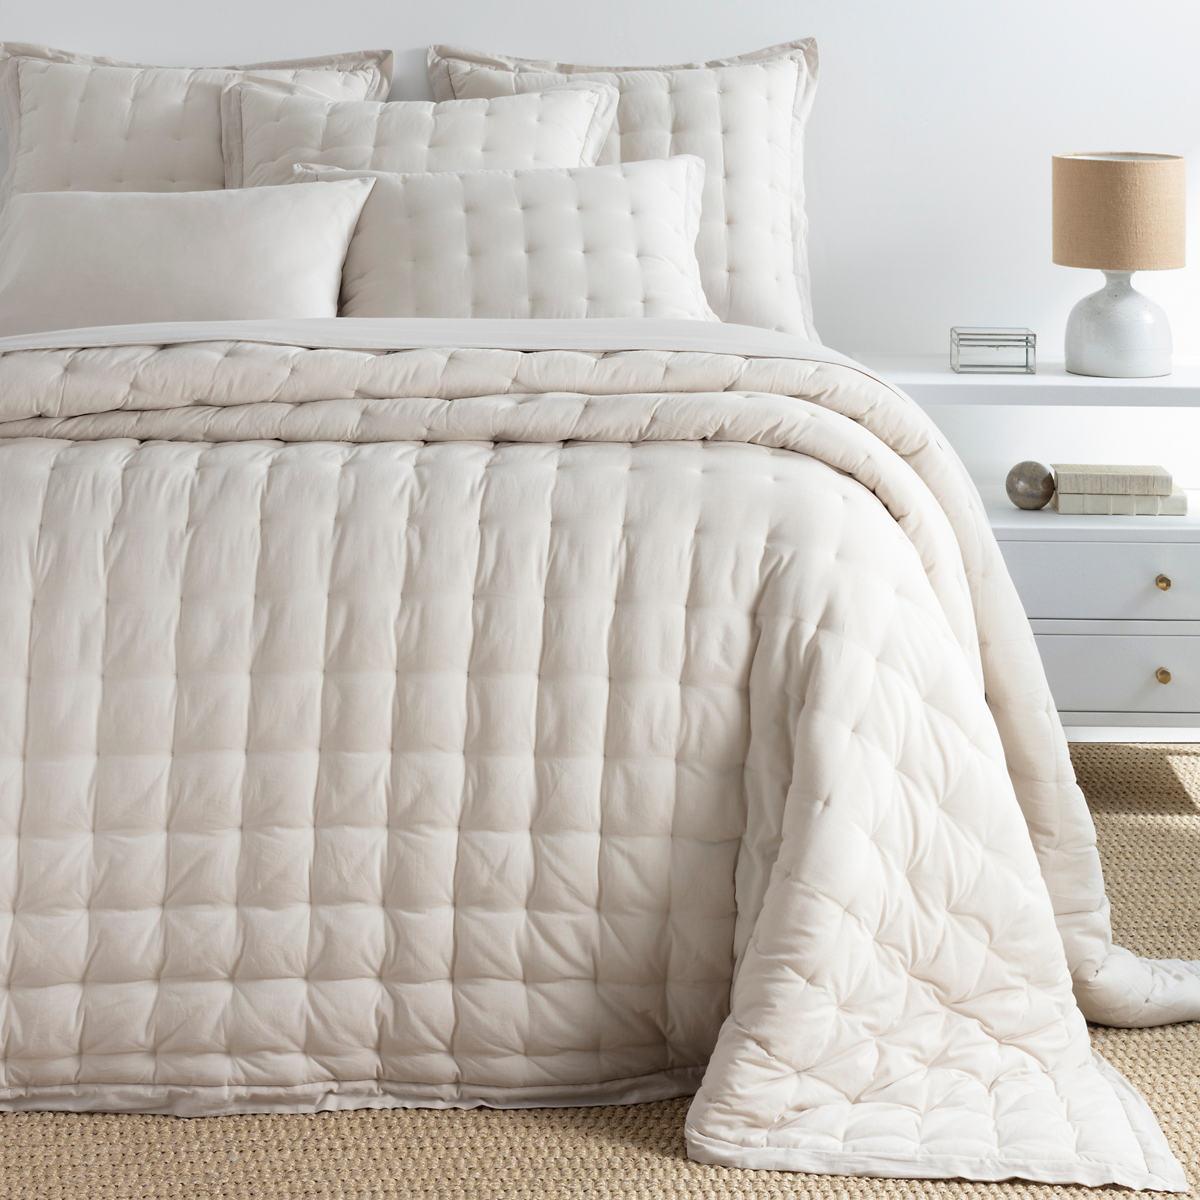 Comfy Cotton Natural Puff